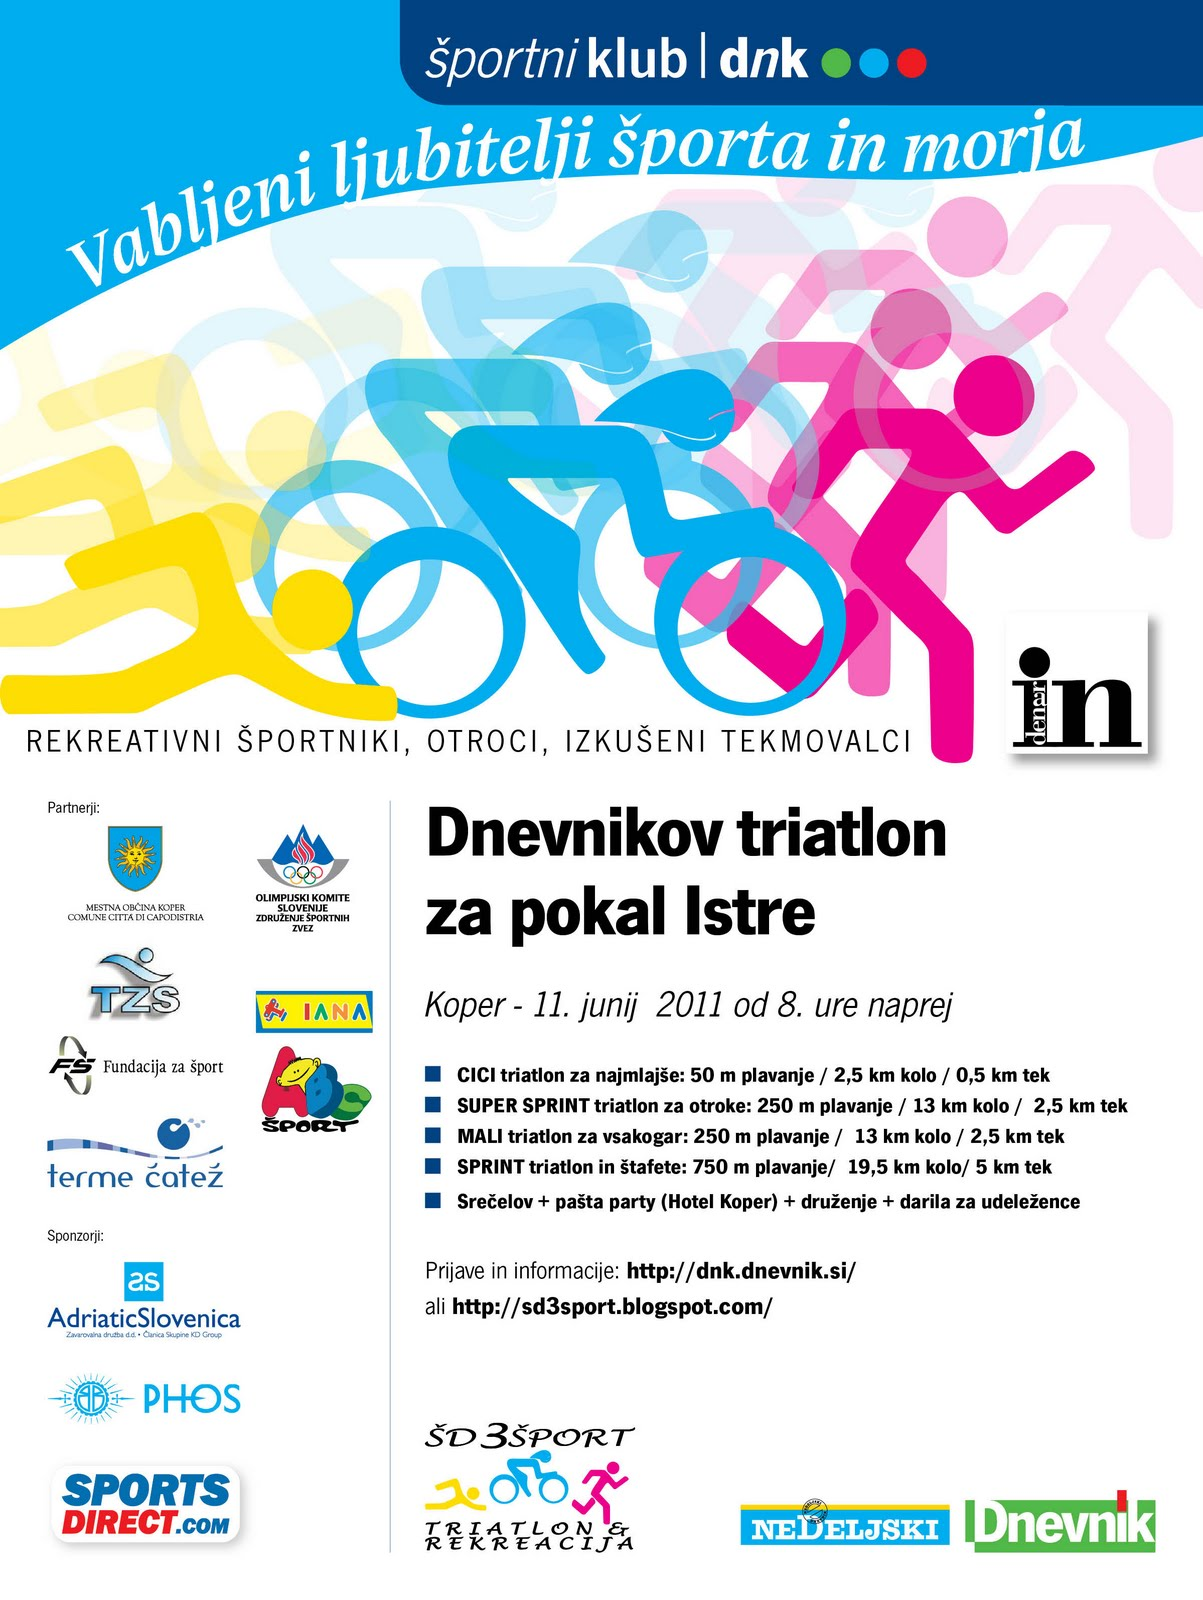 DNEVNIKOV TRIATLON ZA POKAL ISTRE  /  TRIATHLON ISTRIA CUP 2011